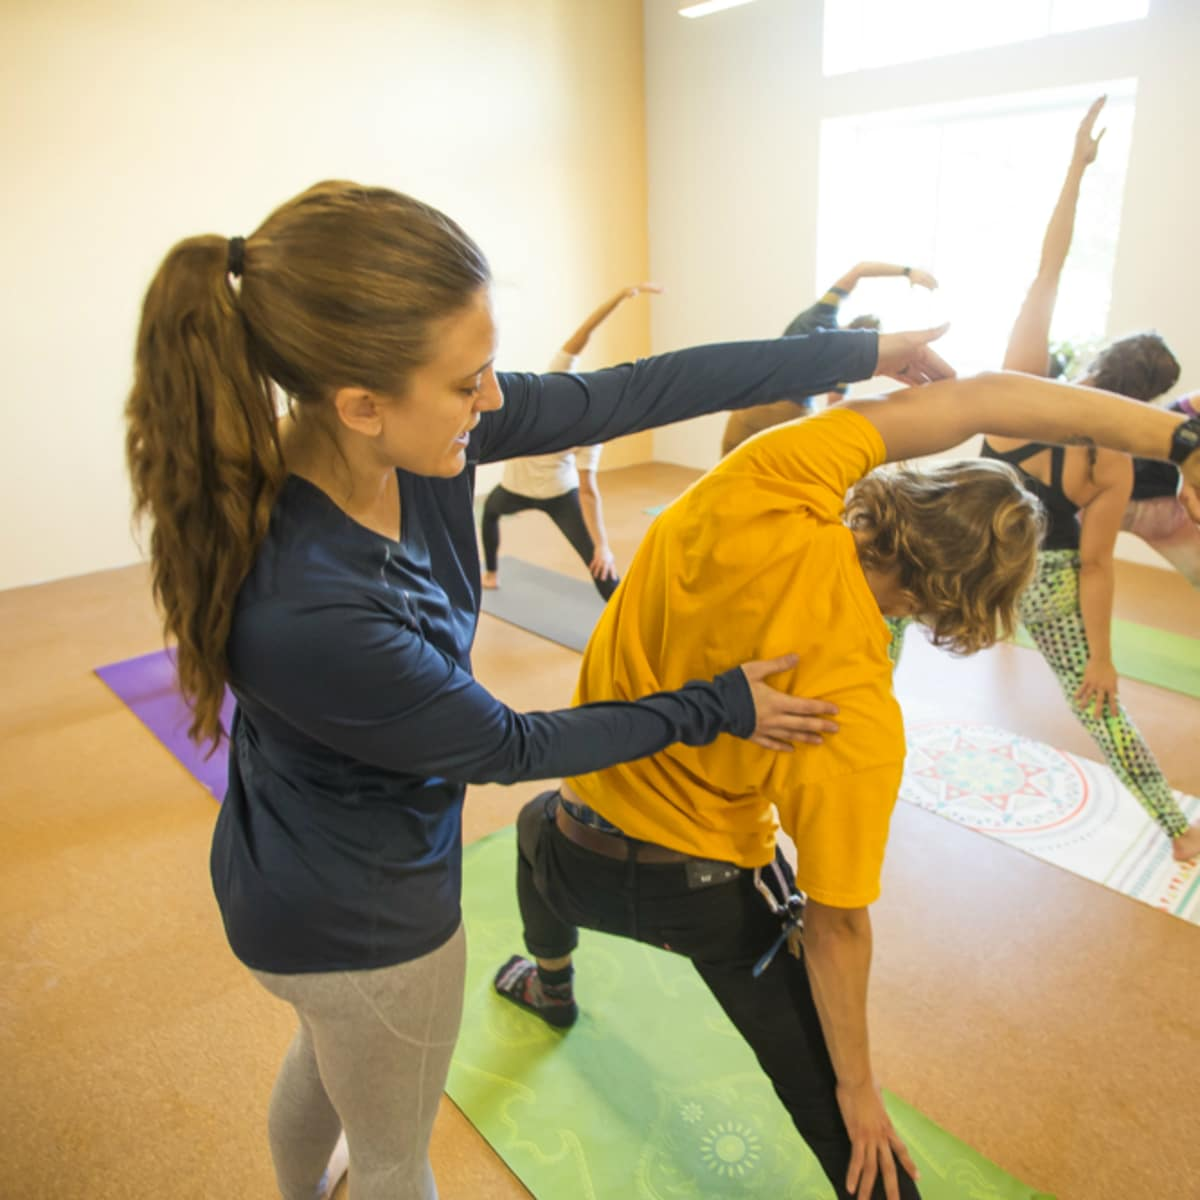 Houston Silver Street rock climbing yoga